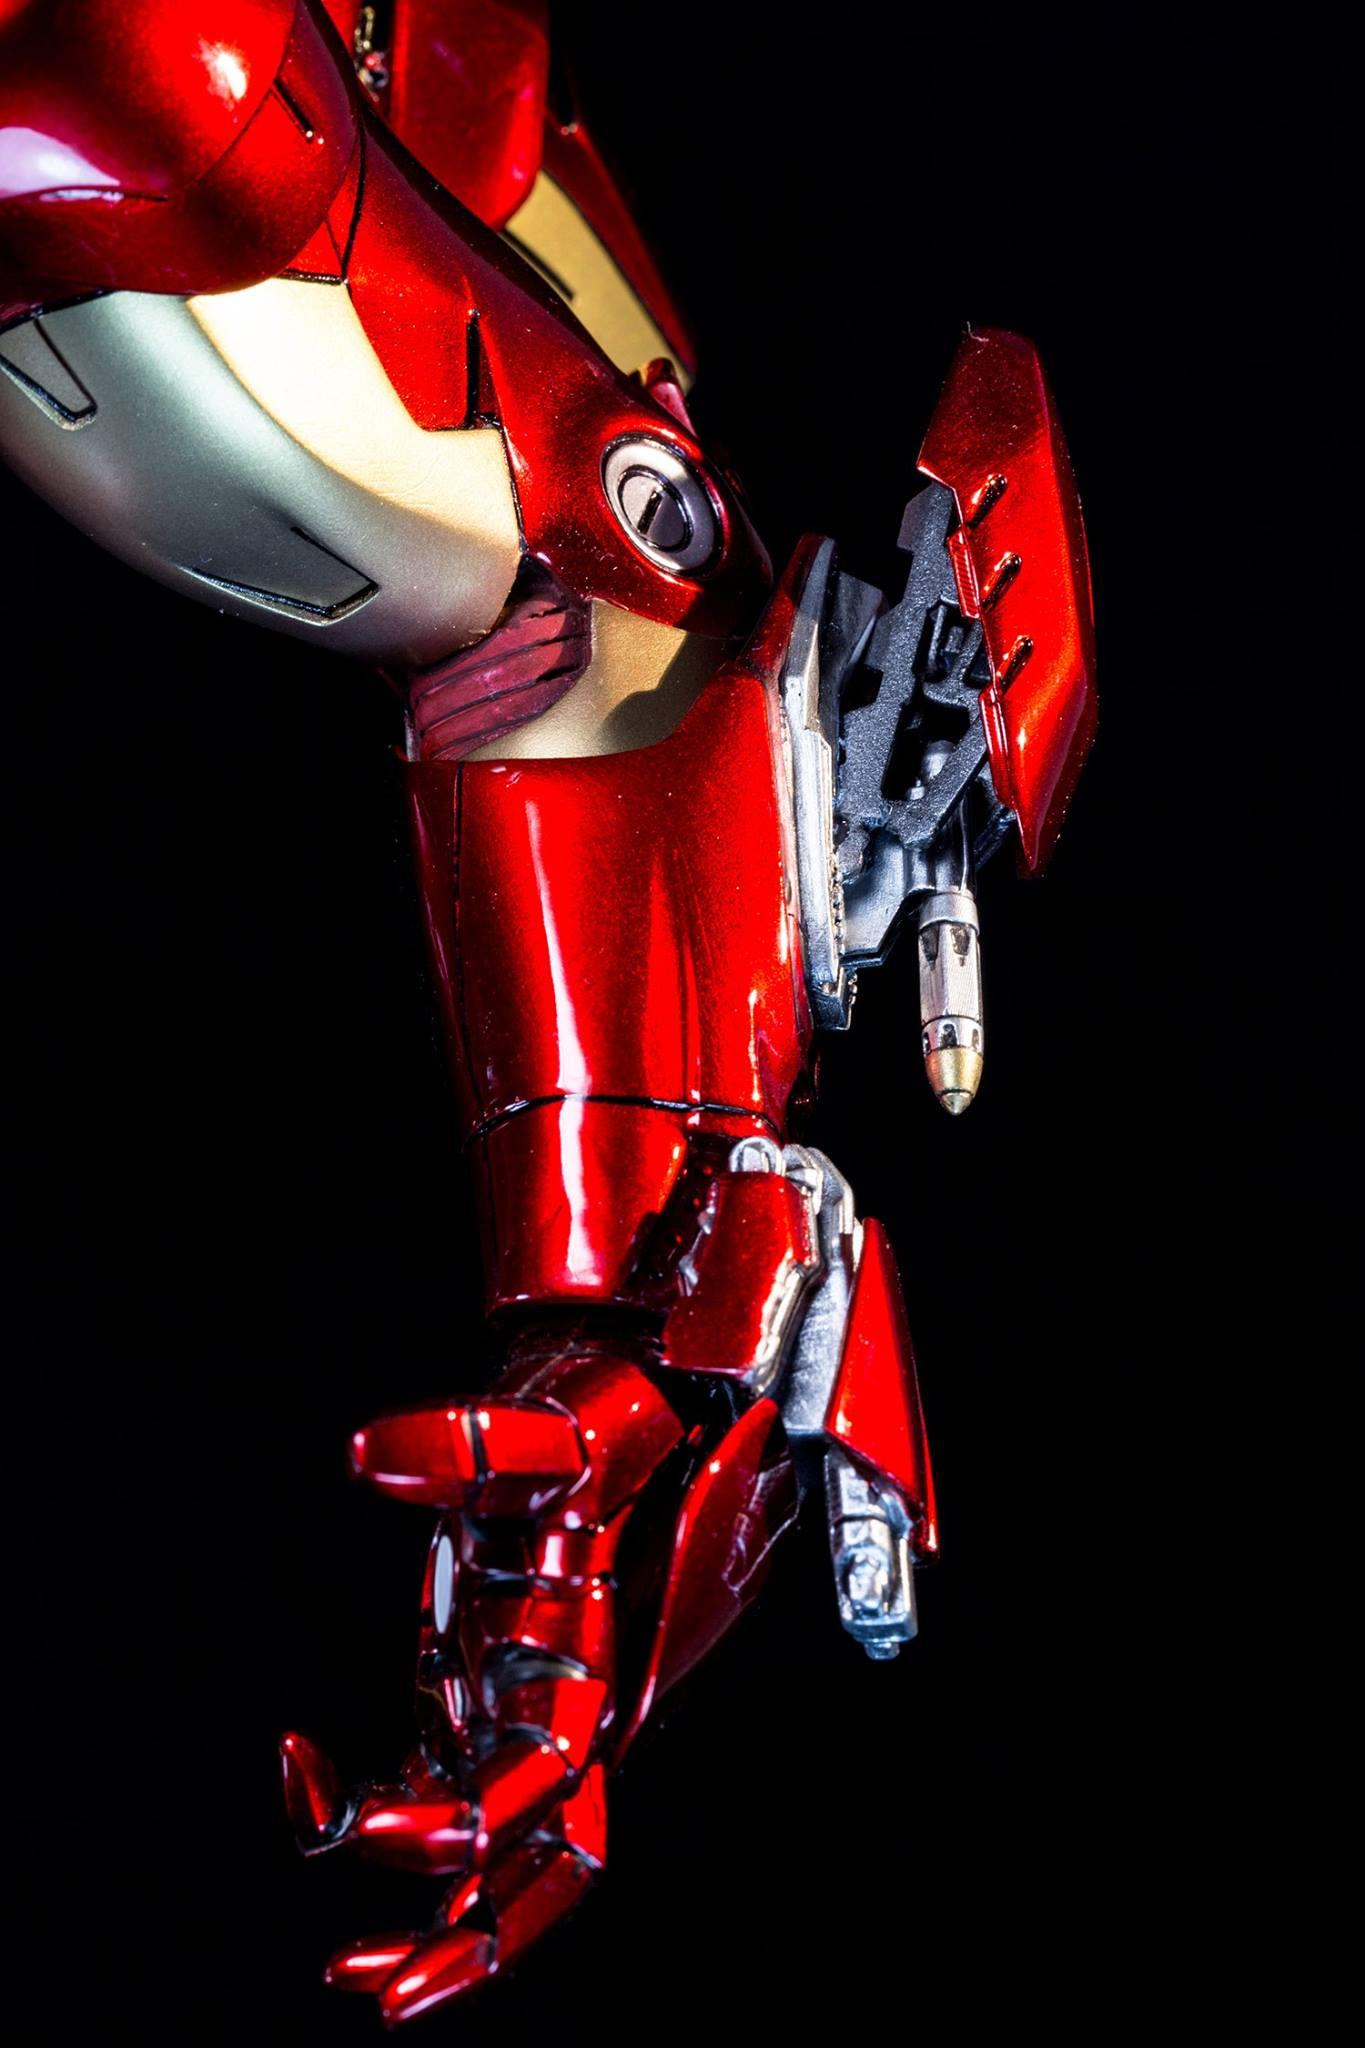 Premium Collectibles : Iron man MK VII - Page 2 196548149248814035865398620415172120573765832524o